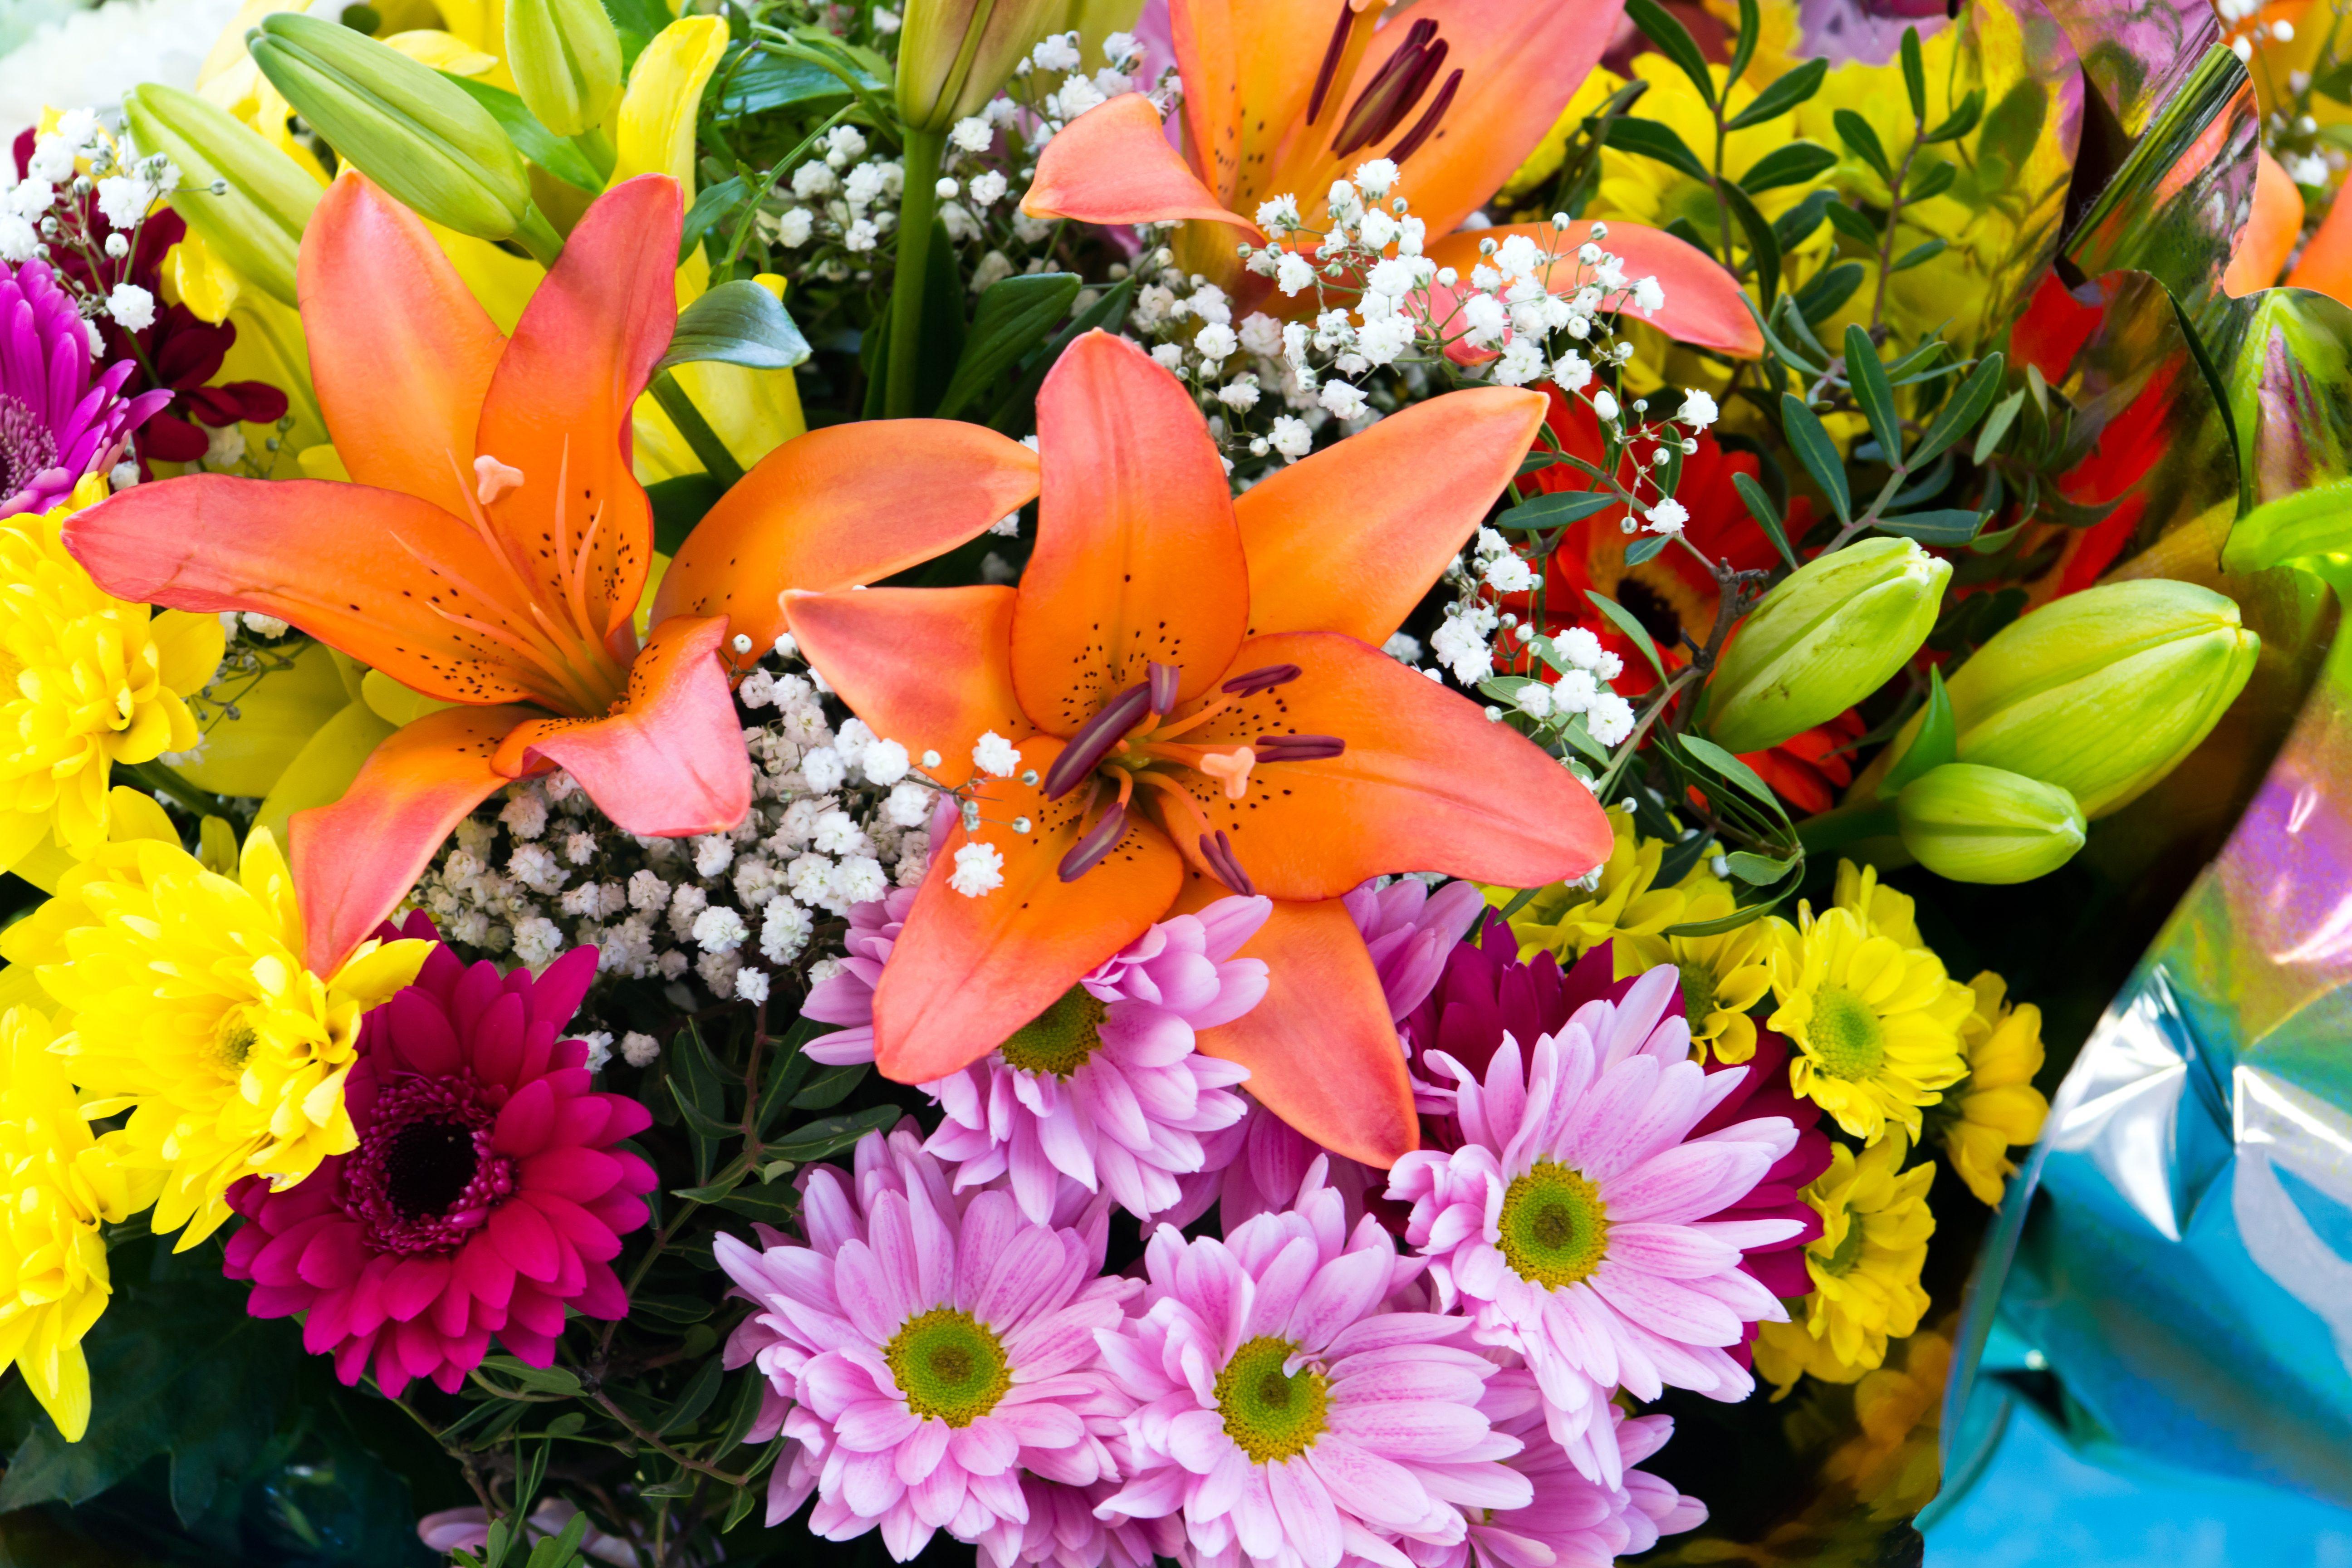 Pin by LemongrassWedding on Fresh Flower Bouquets | Pinterest ...